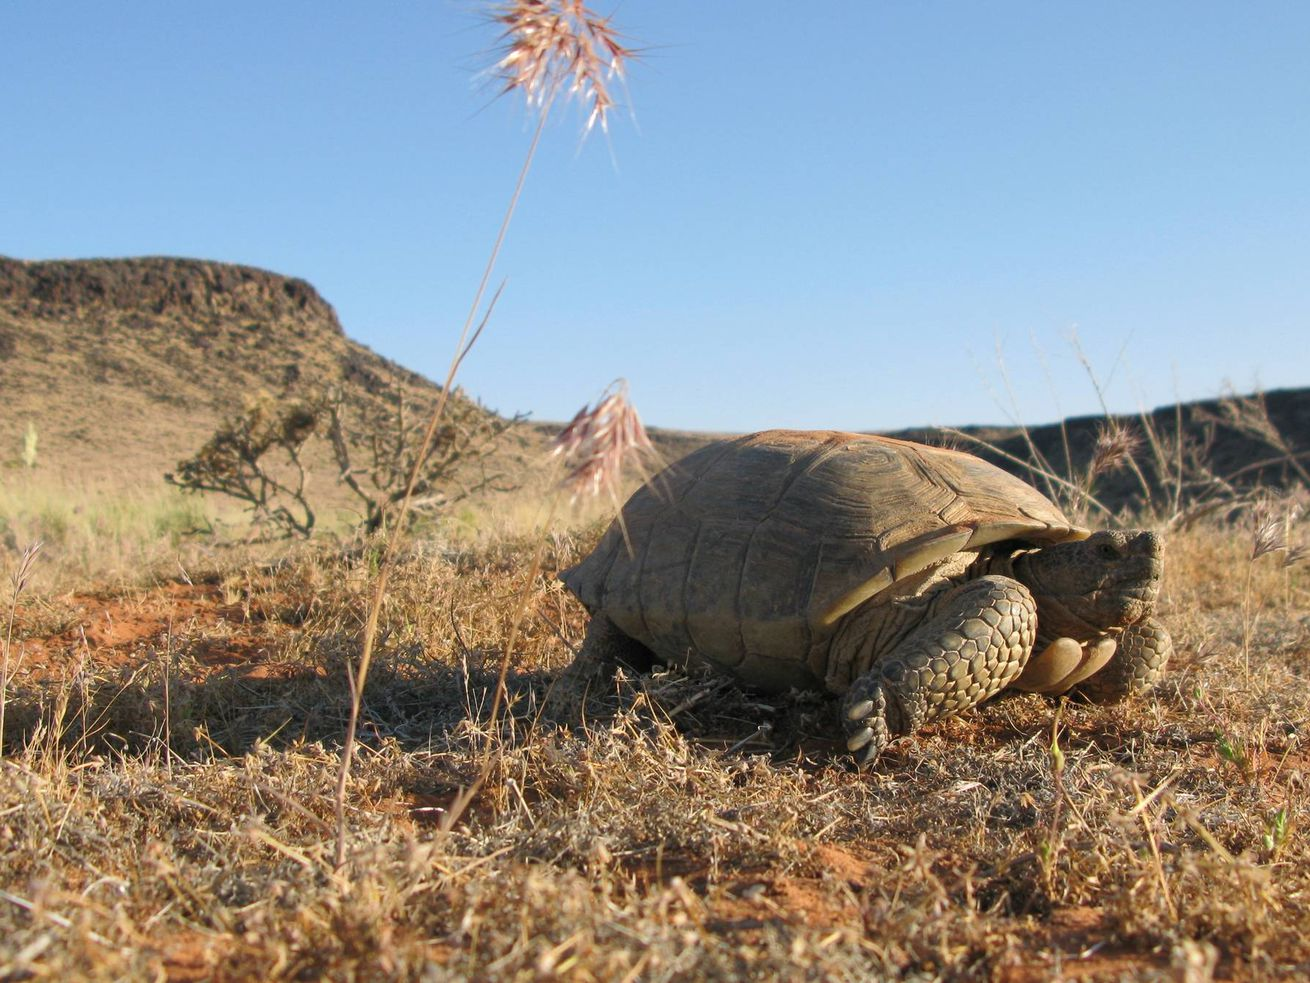 A desert tortoise basks in the sun in  2010.